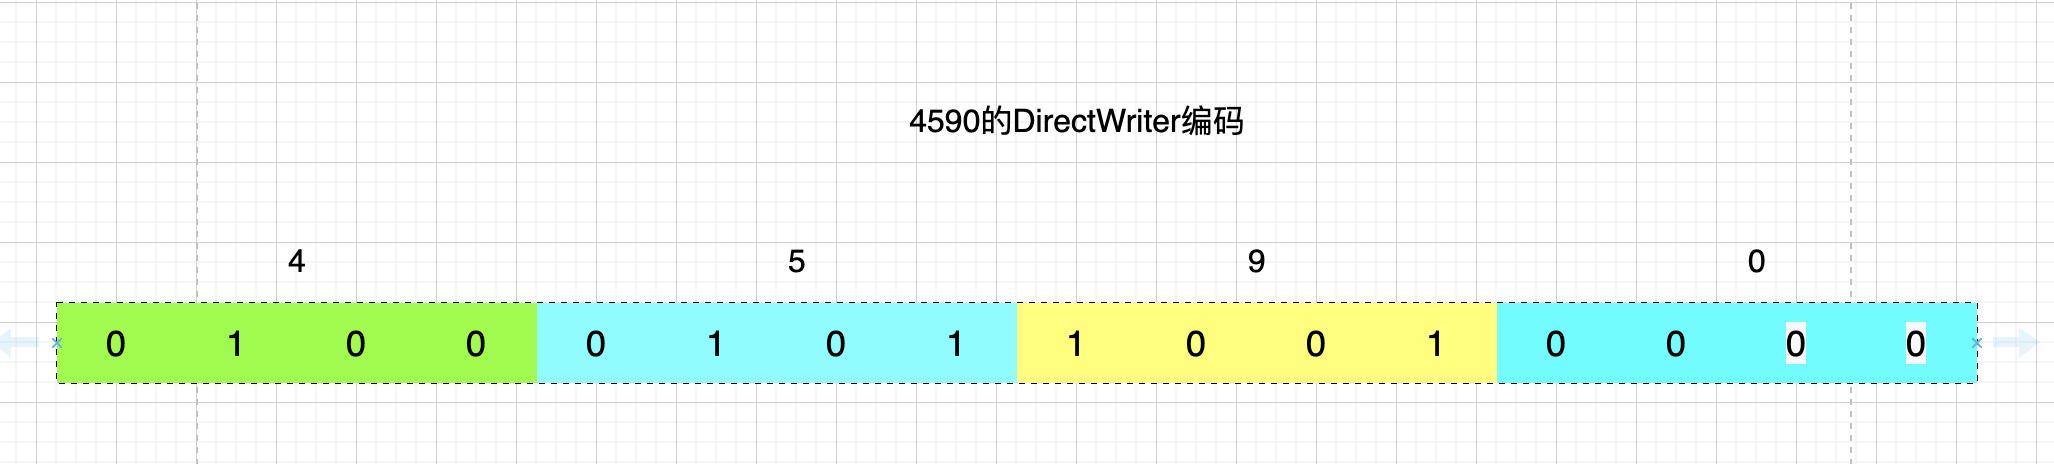 2021-01-24-20-44-53